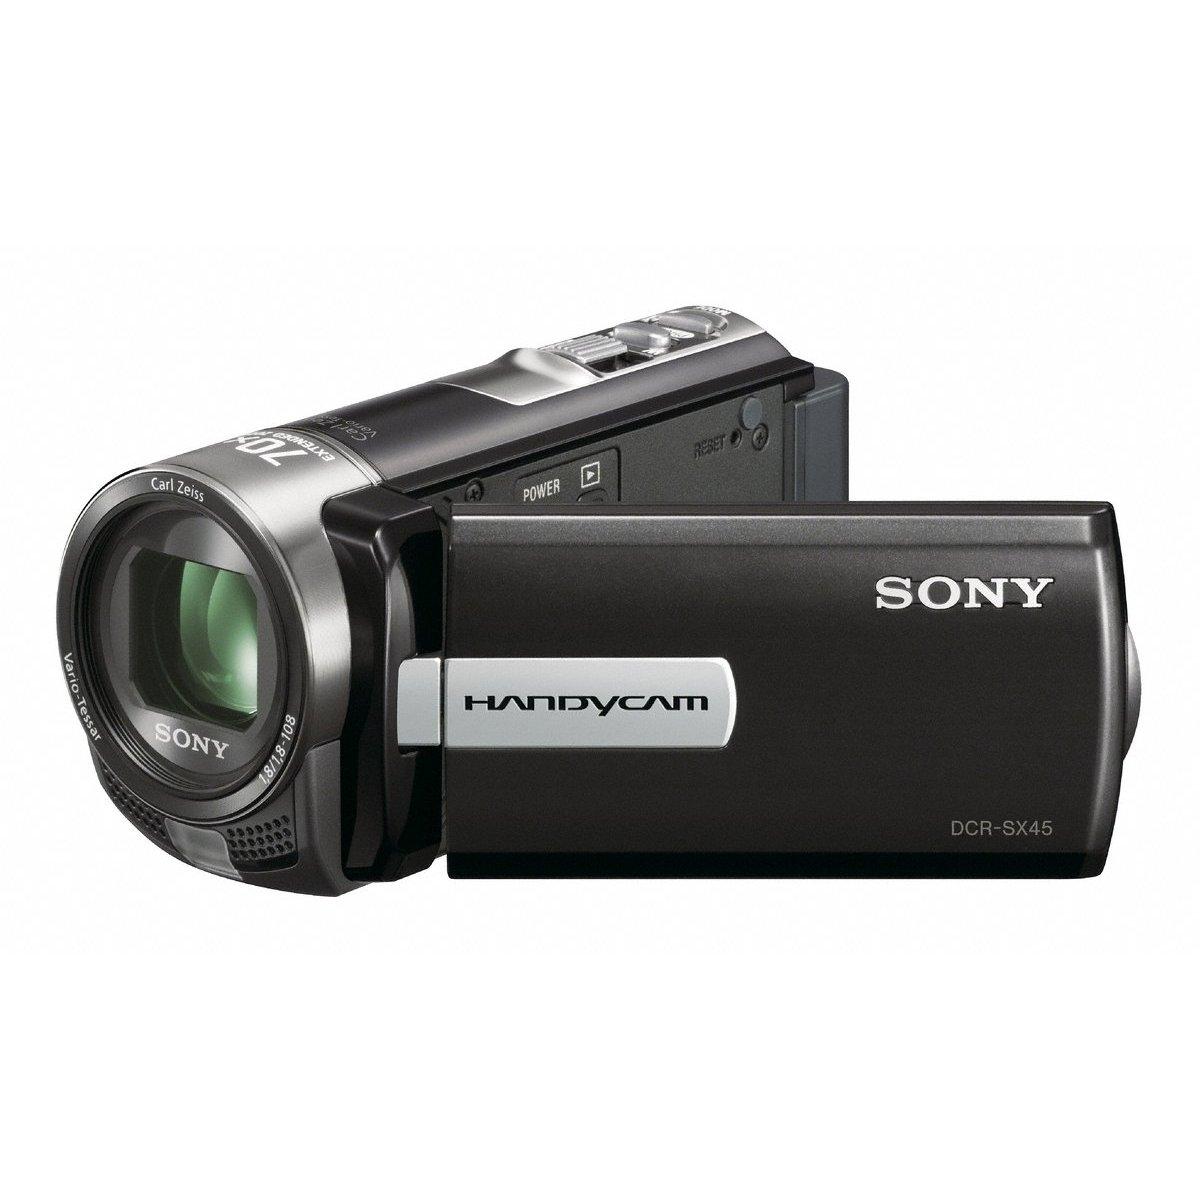 sony handycam capture software free download